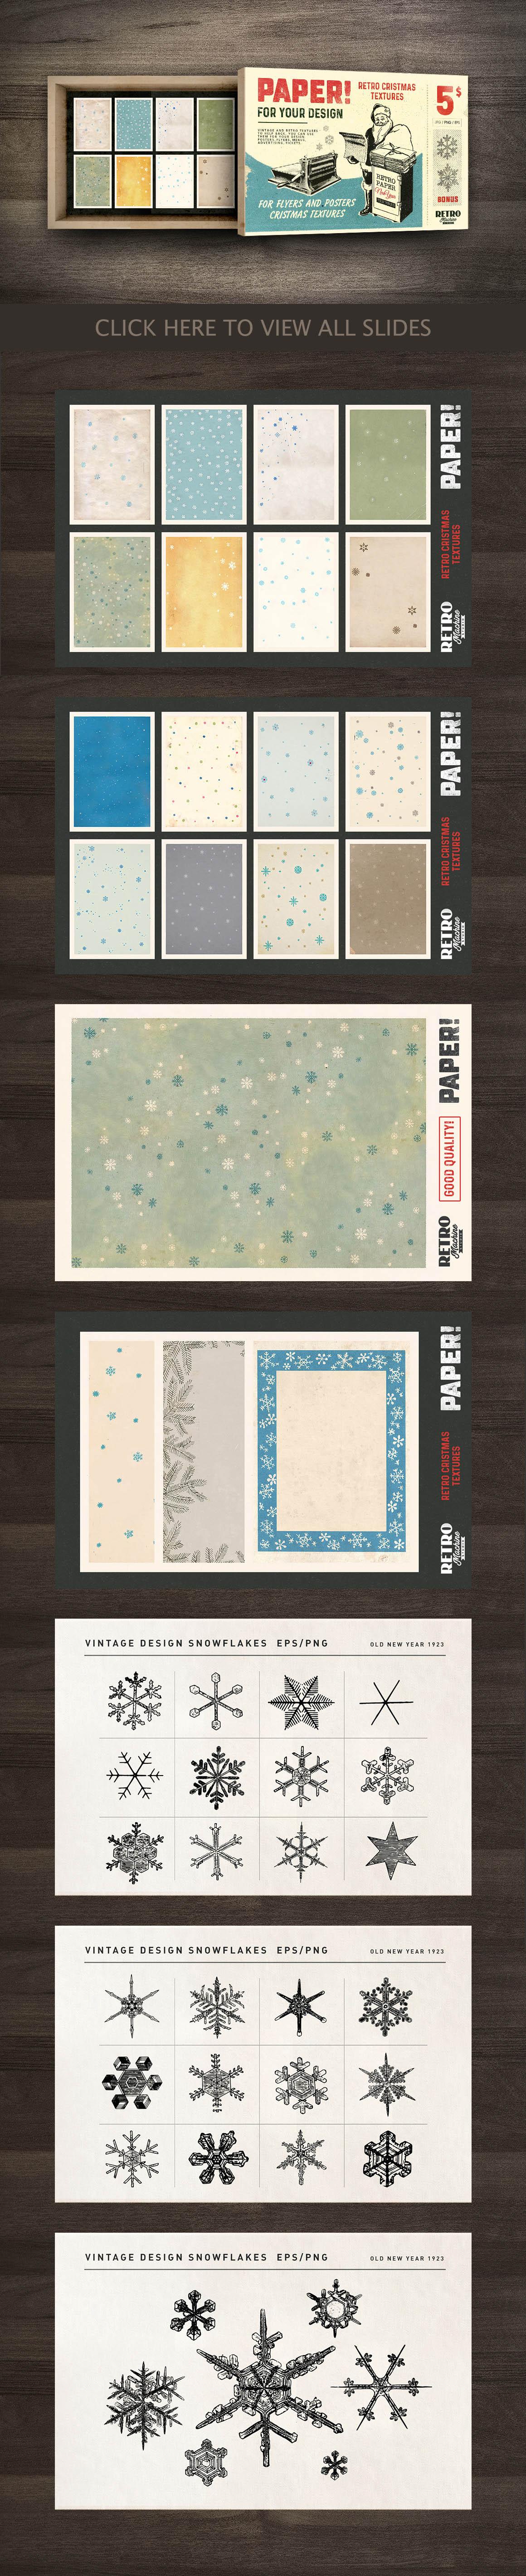 Retro-Graphics-Bundle-dealjumbo-08